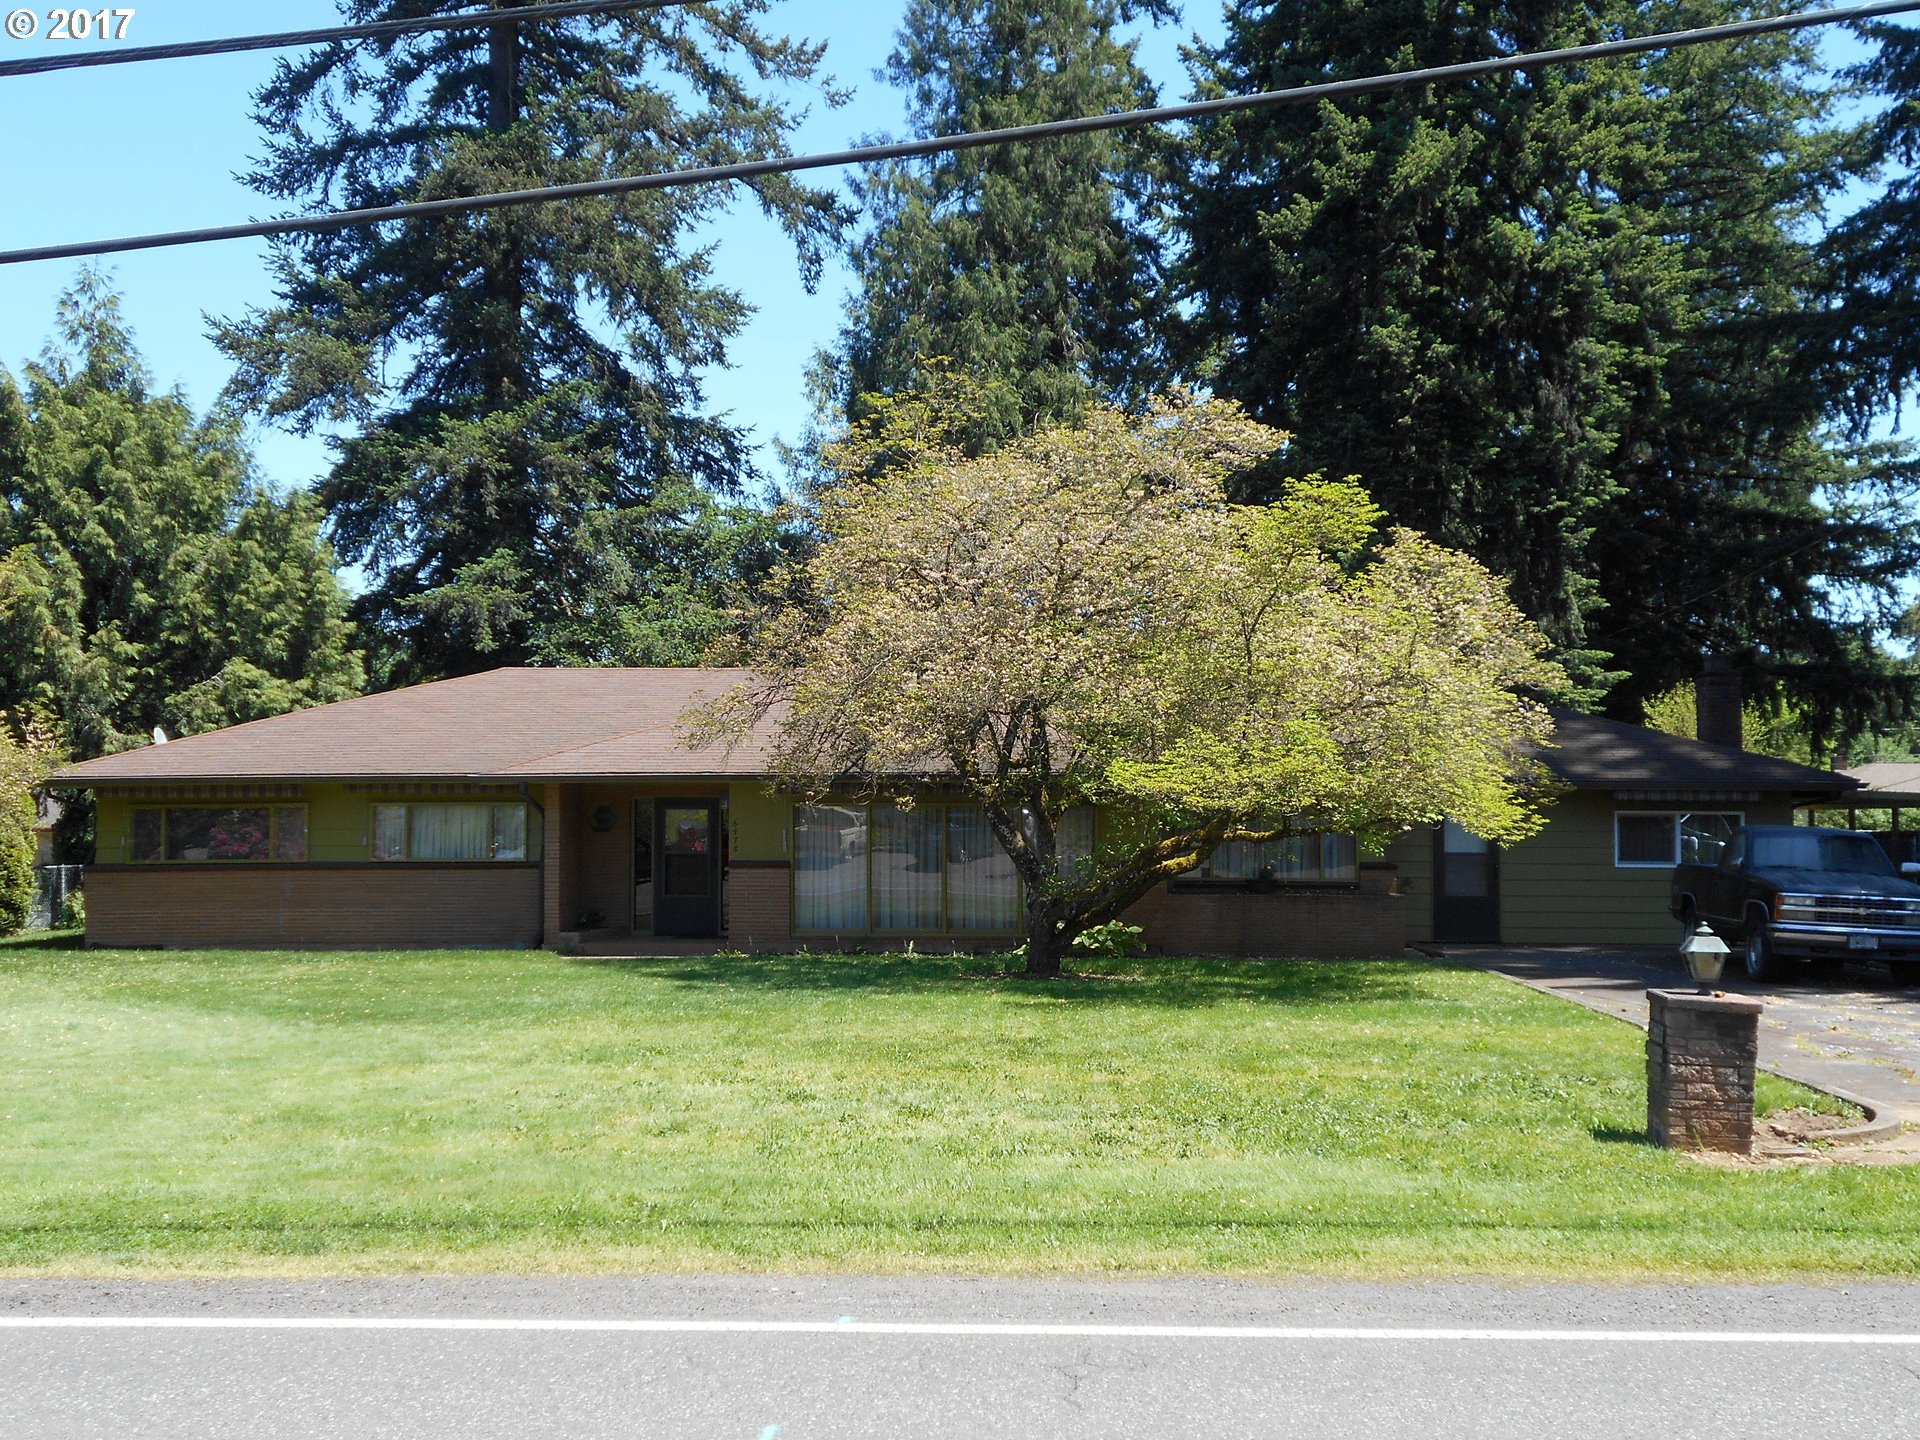 6478 SE 134TH AVE, Portland, OR 97236